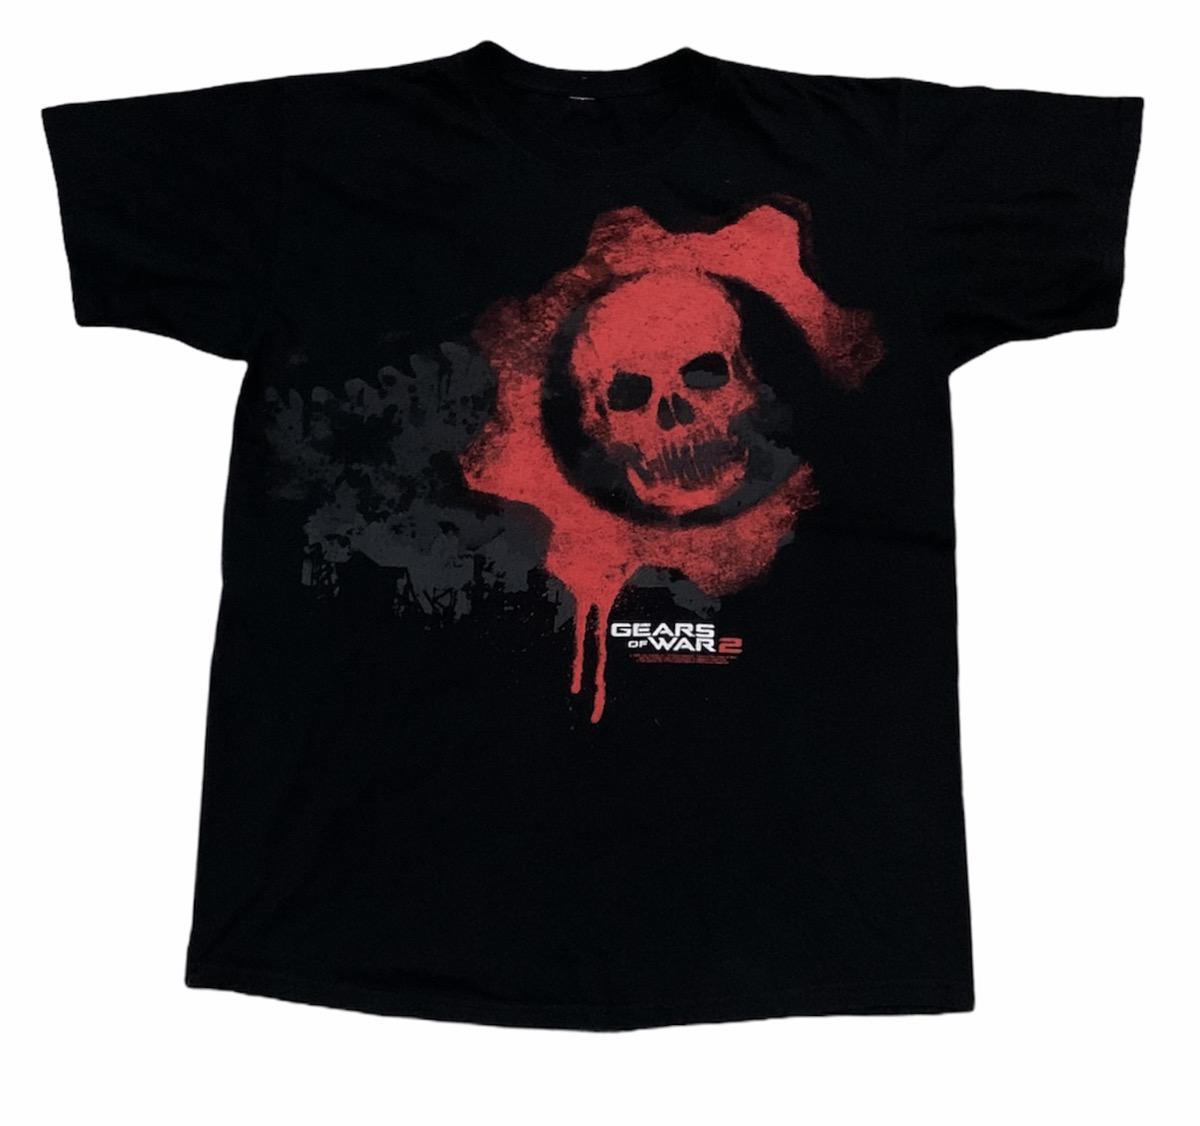 Rare Design Vintage Video Game Gears Of War 2 T-shirt 2000s